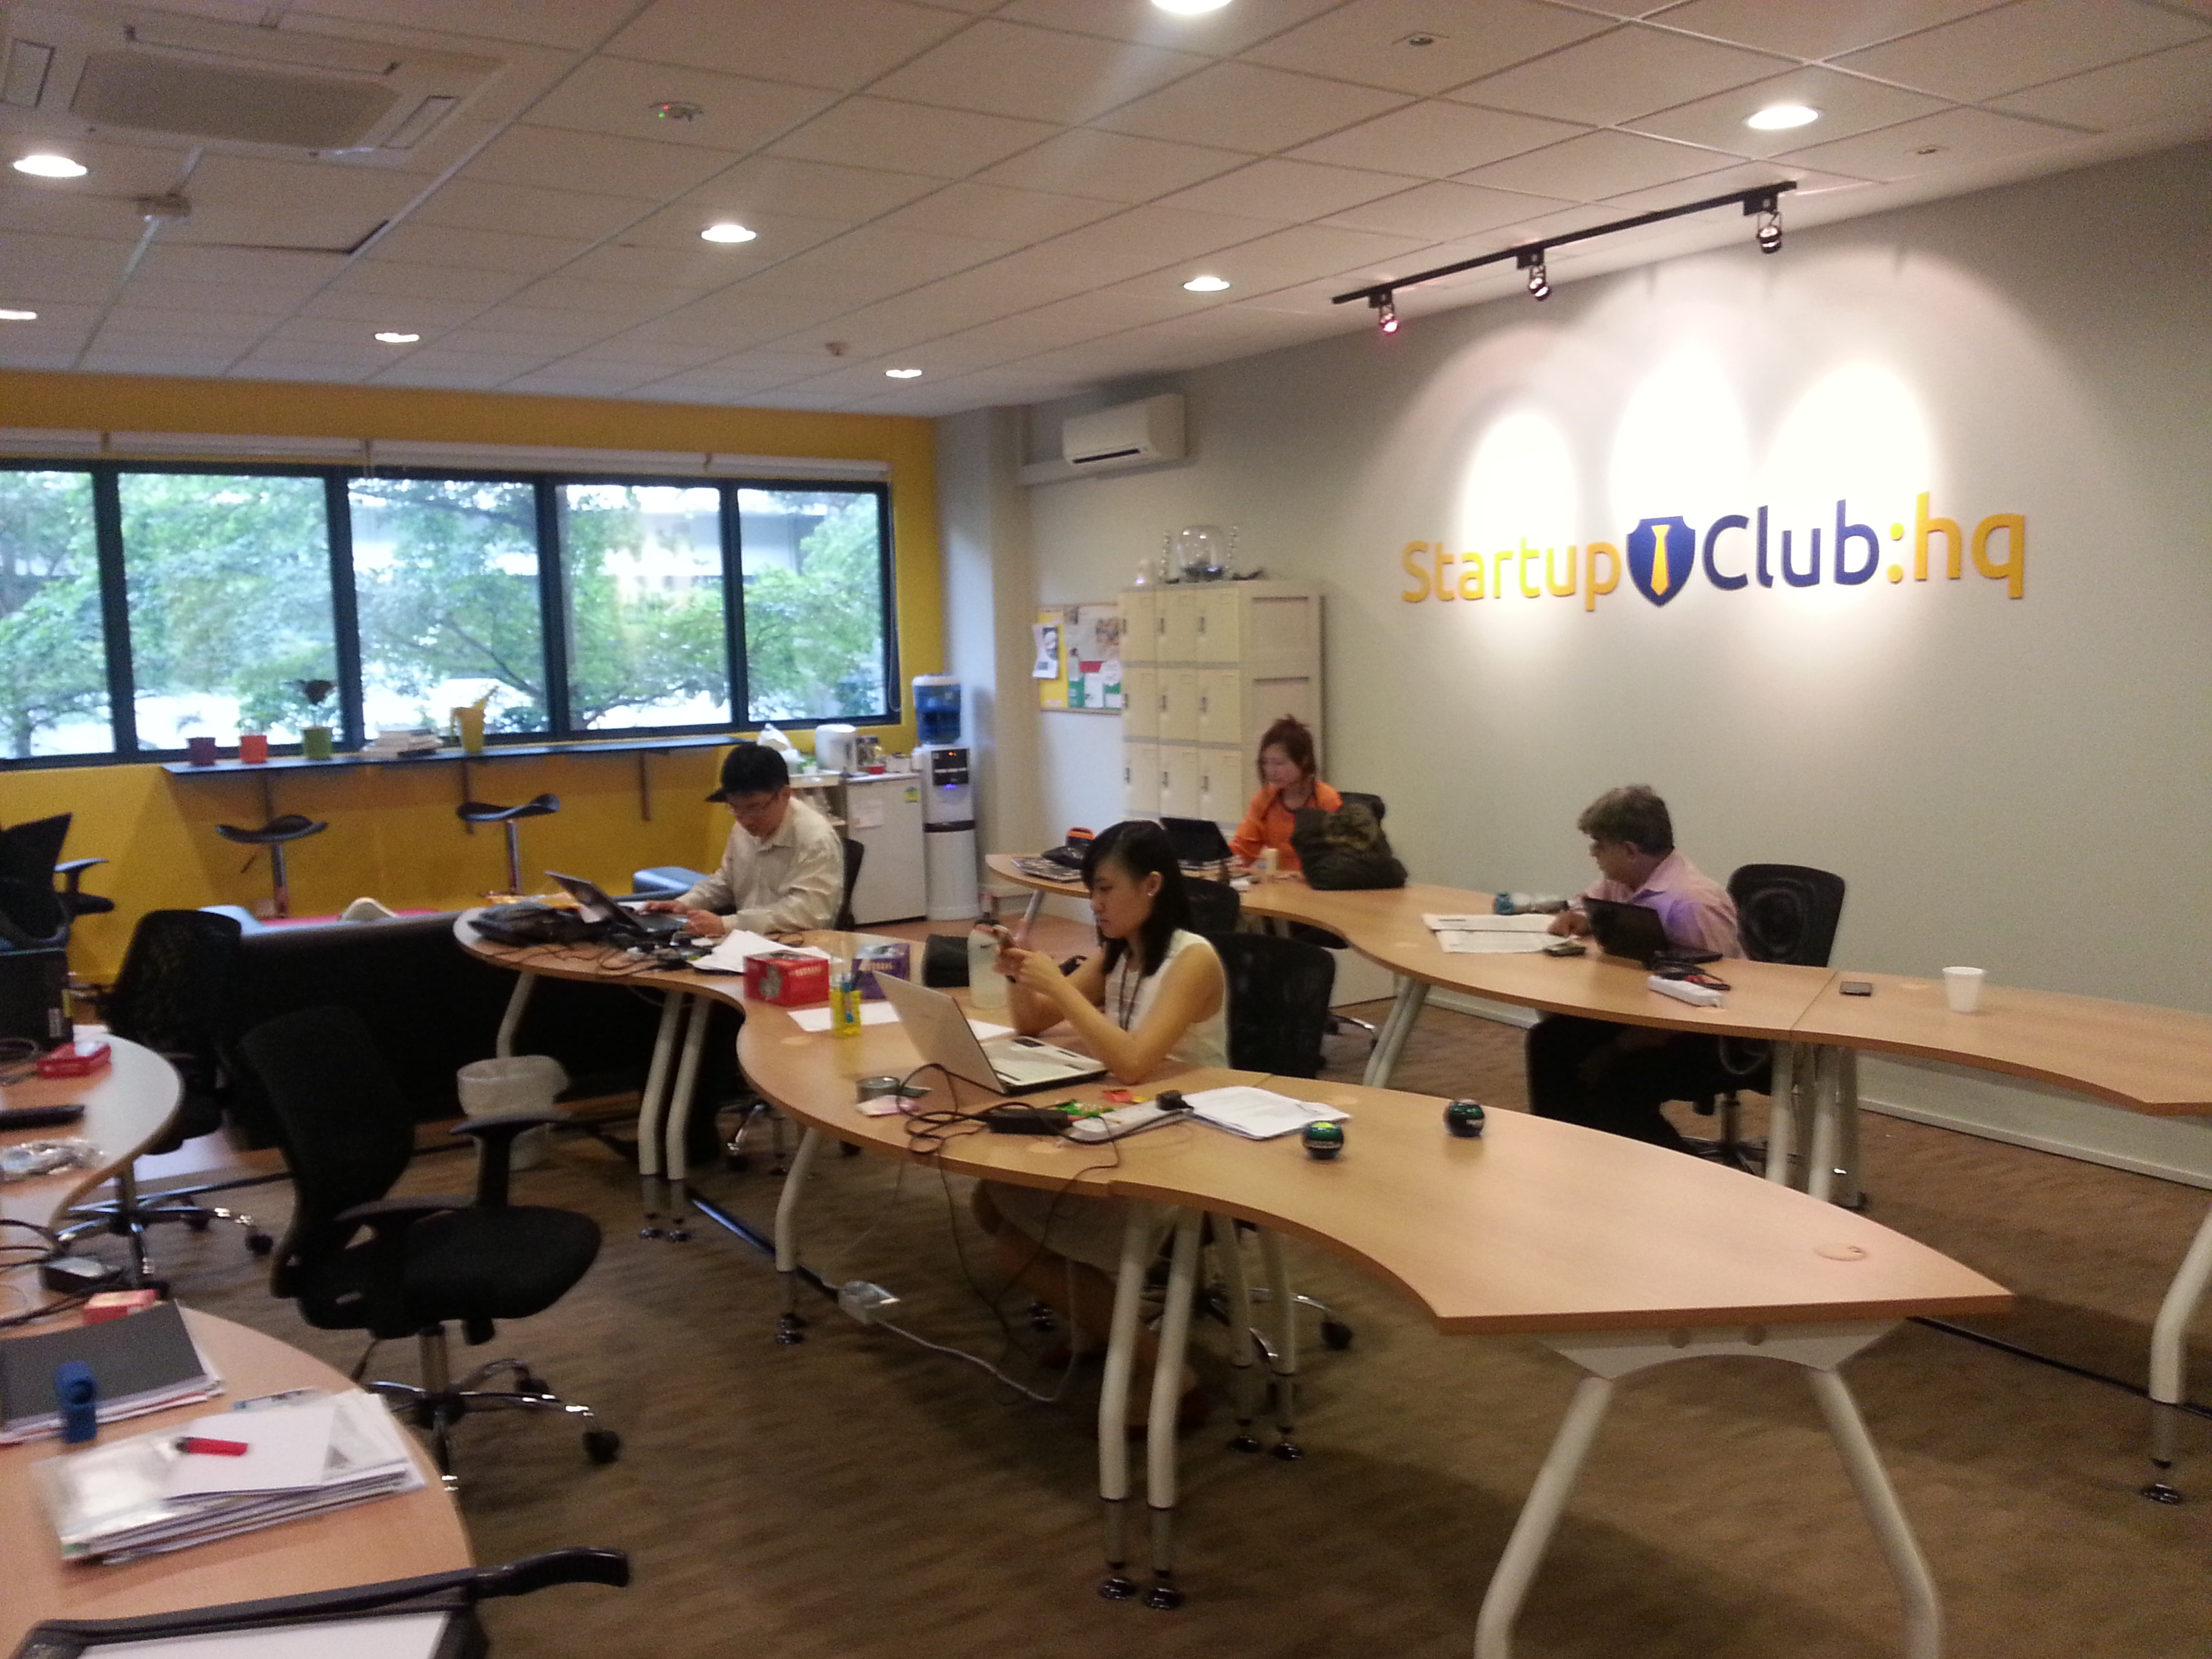 startupclub